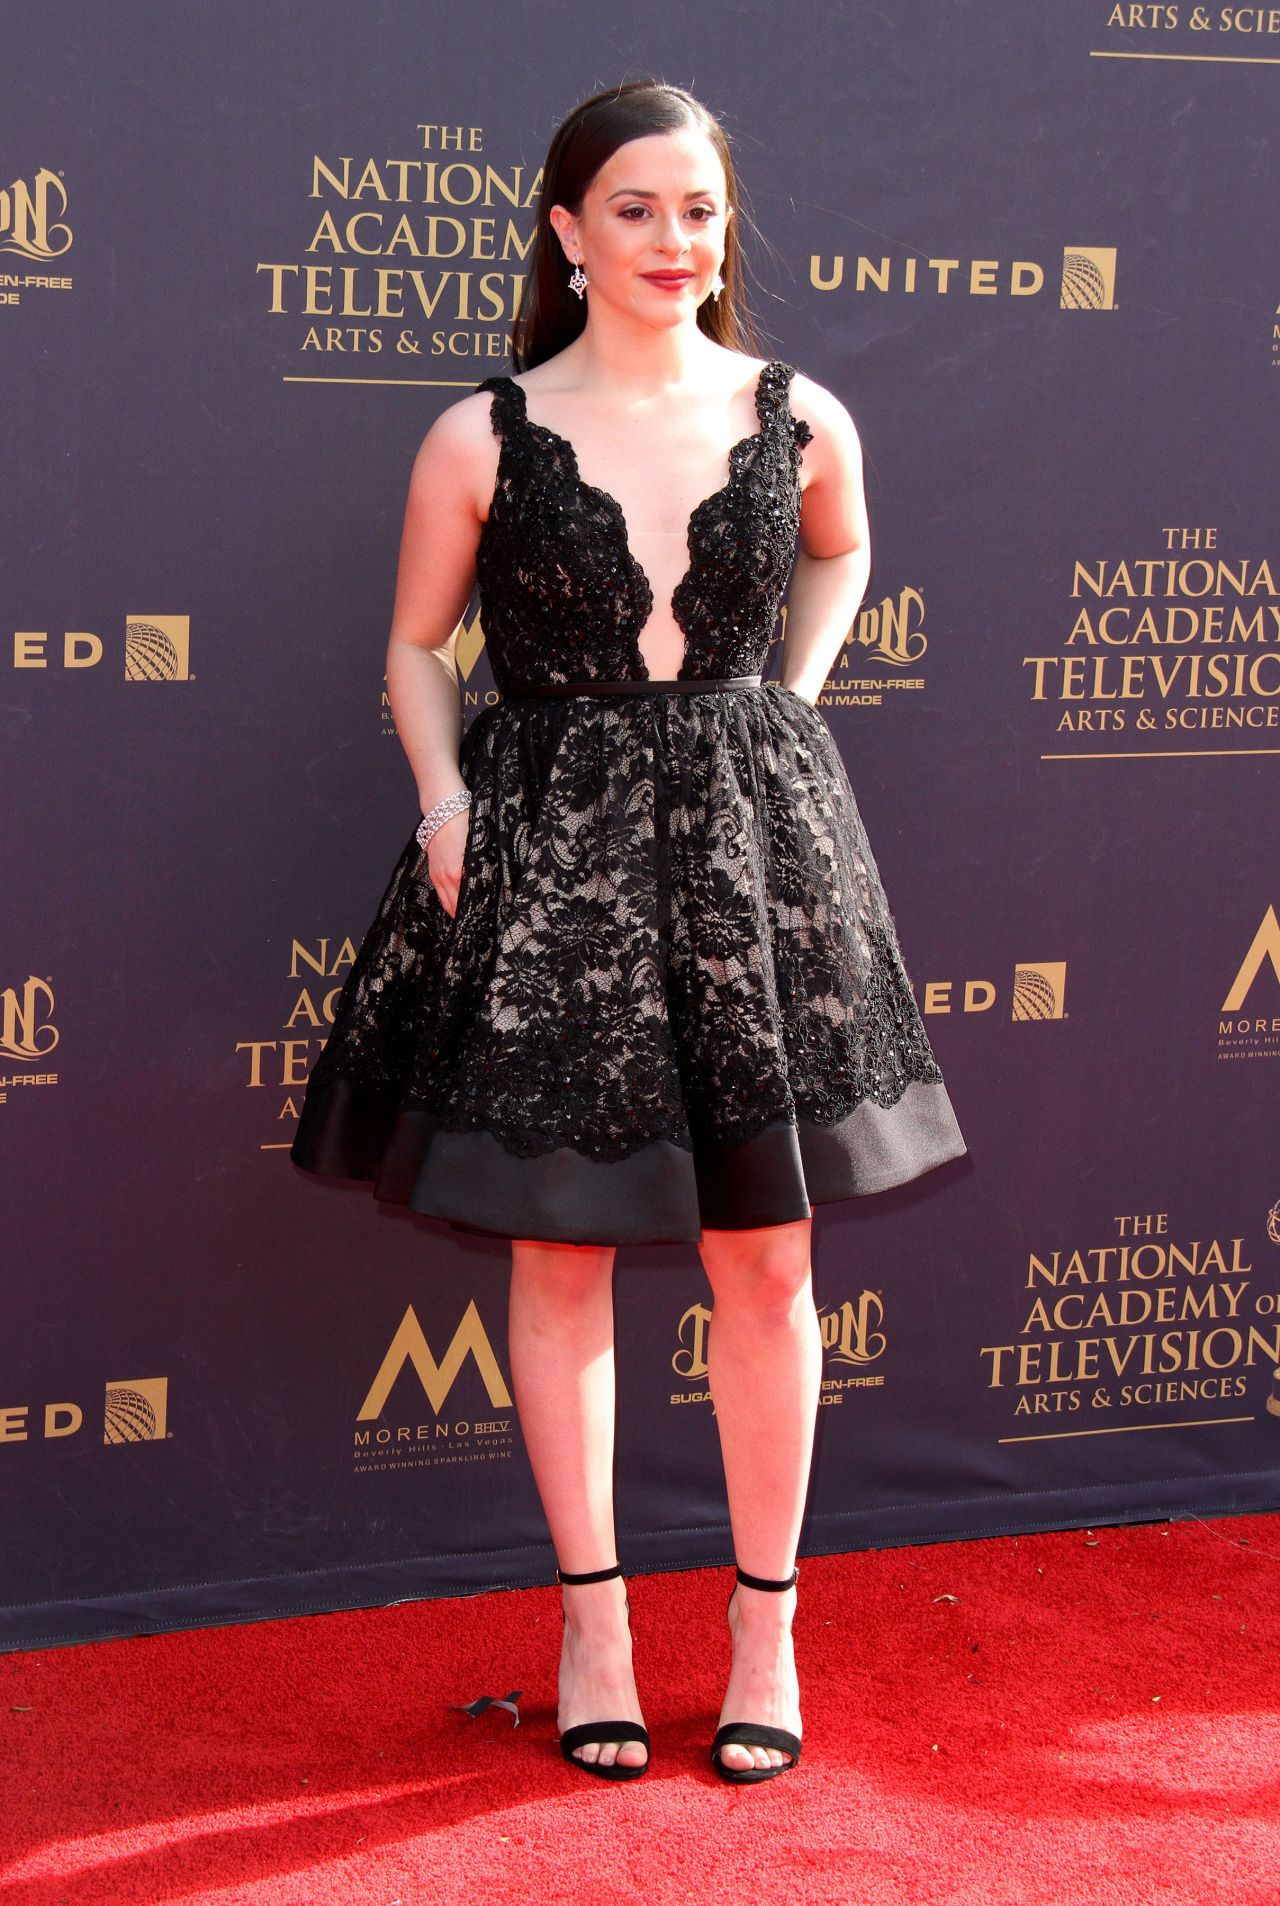 Adrianna di liello on red carpet daytime creative arts emmy awards 2019 in pasadena